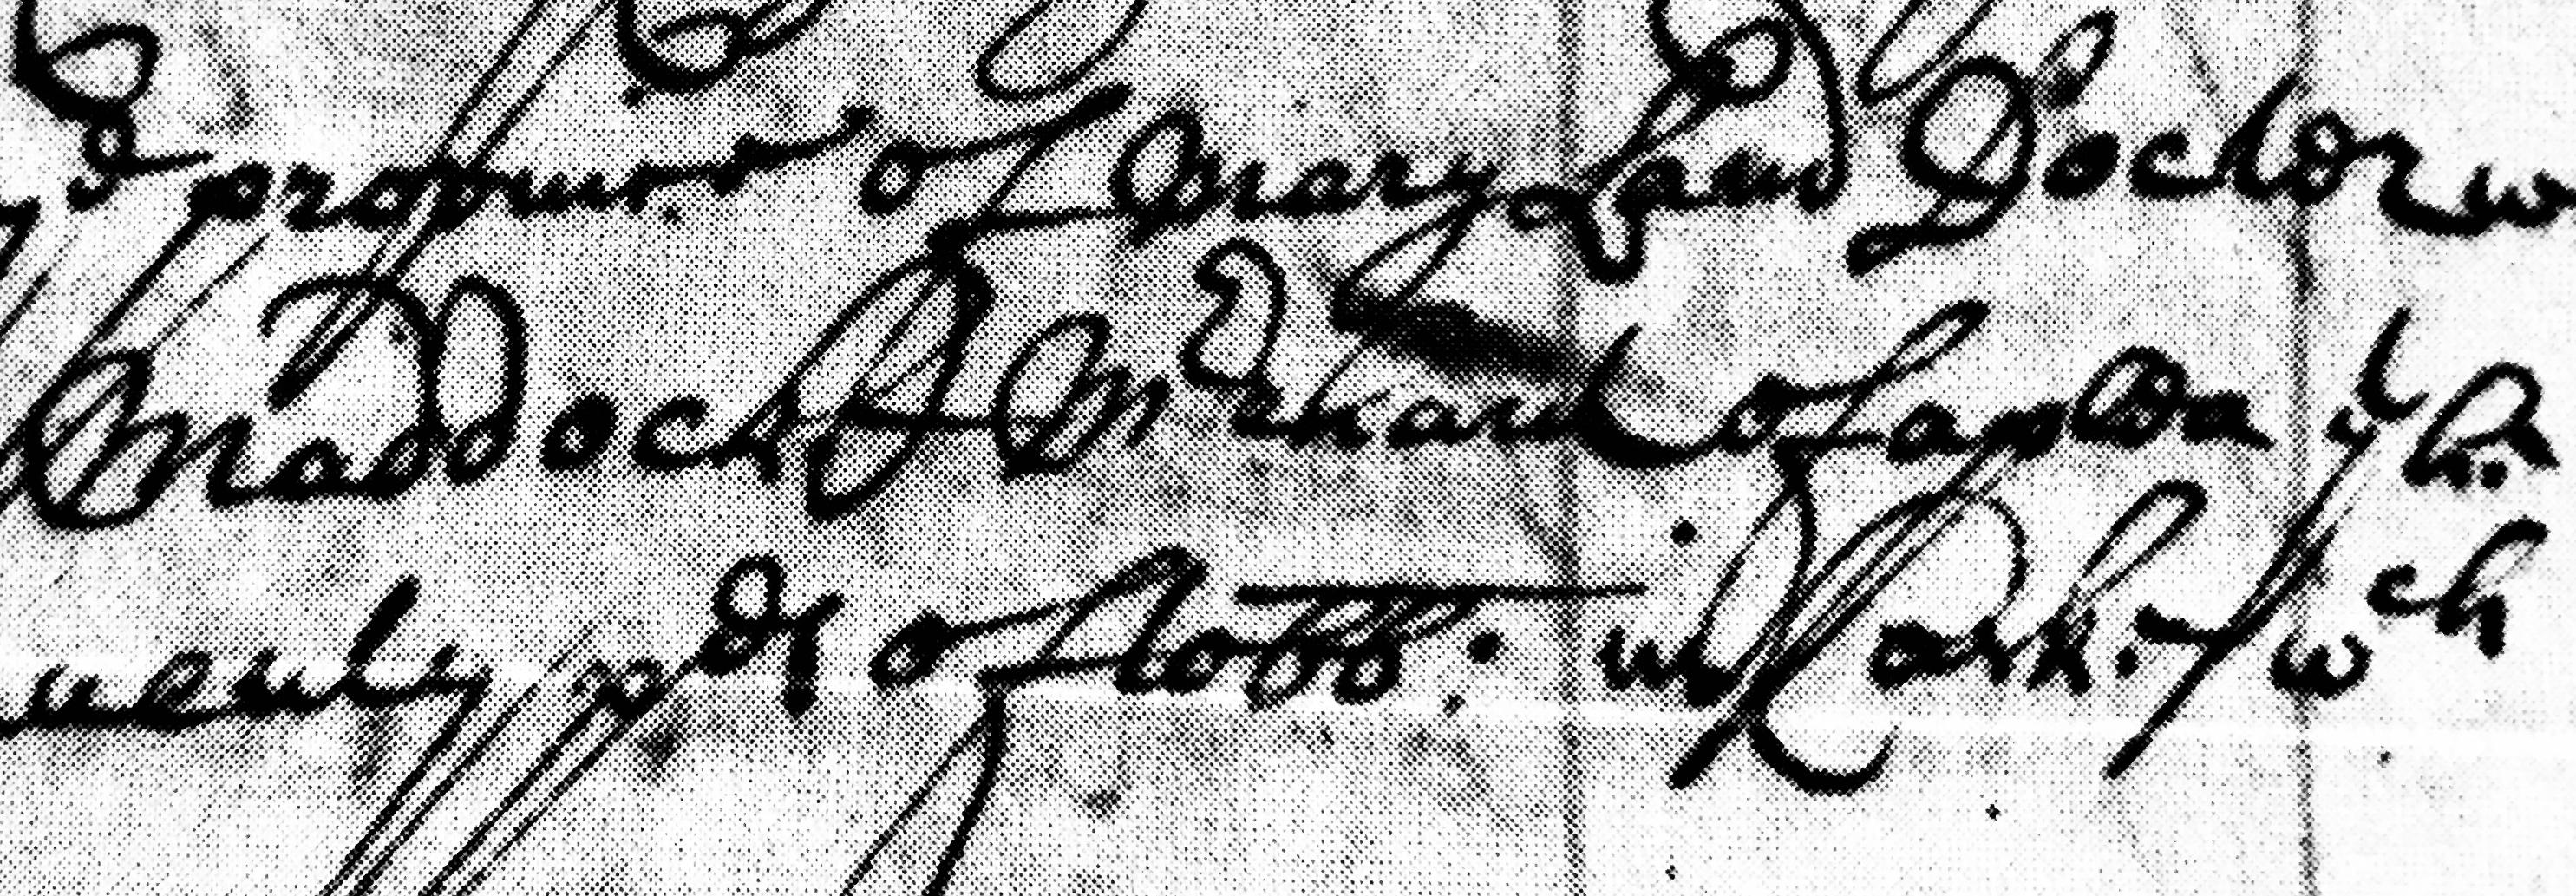 Cornelius Maddox merchant of what 1684